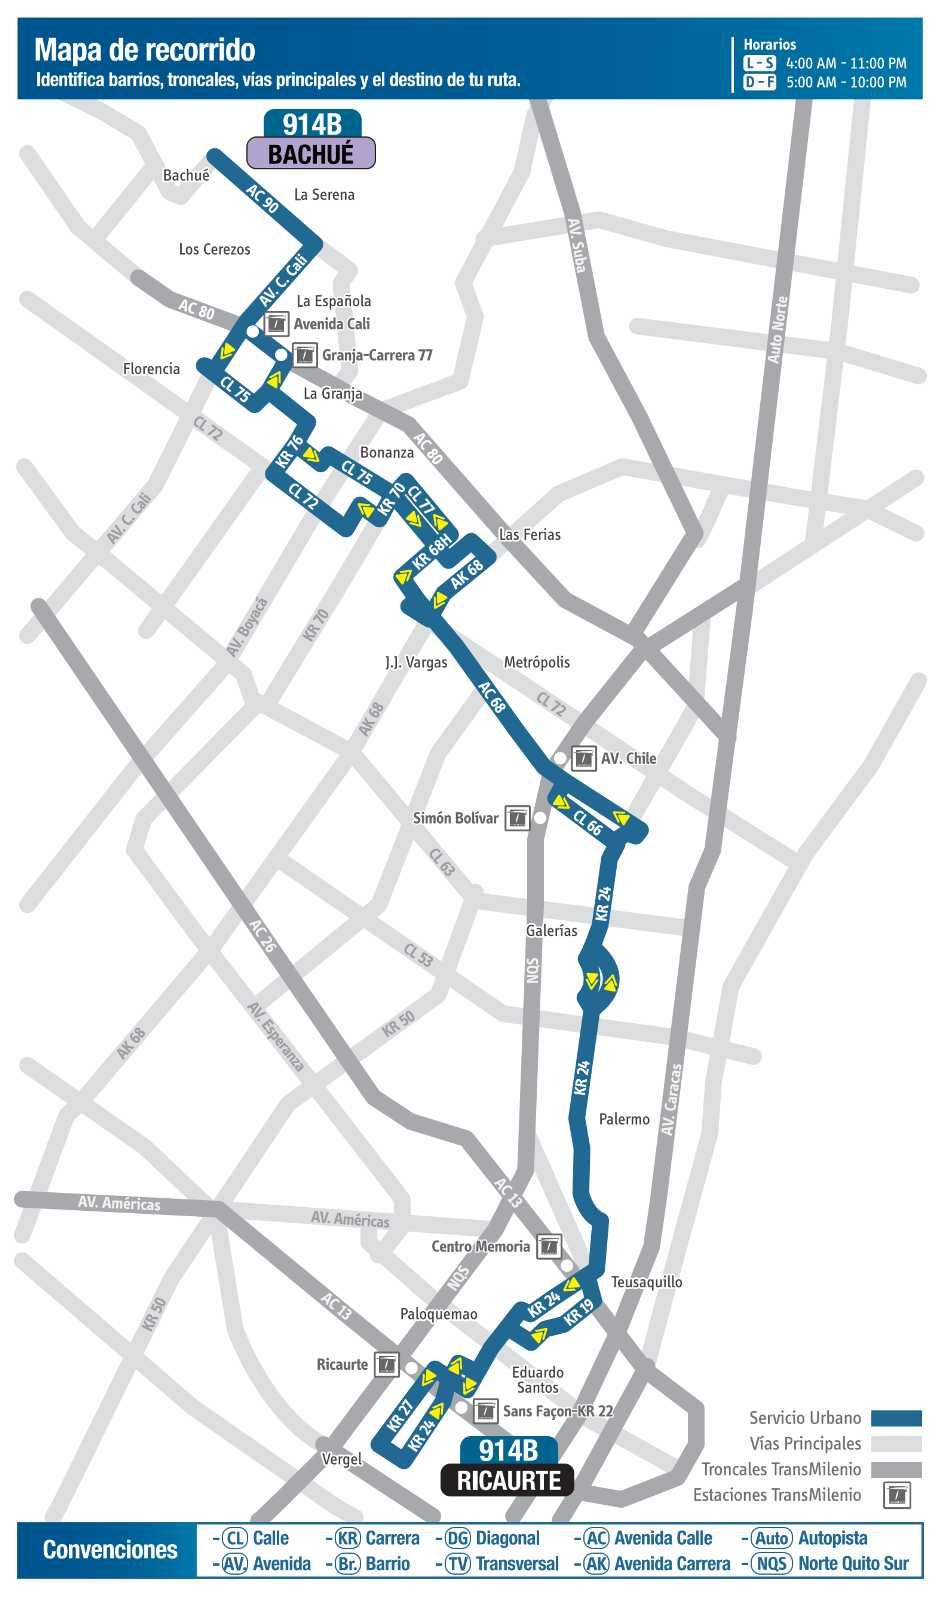 Ruta SITP: 914B Bachué ↔ Ricaurte (mapa)